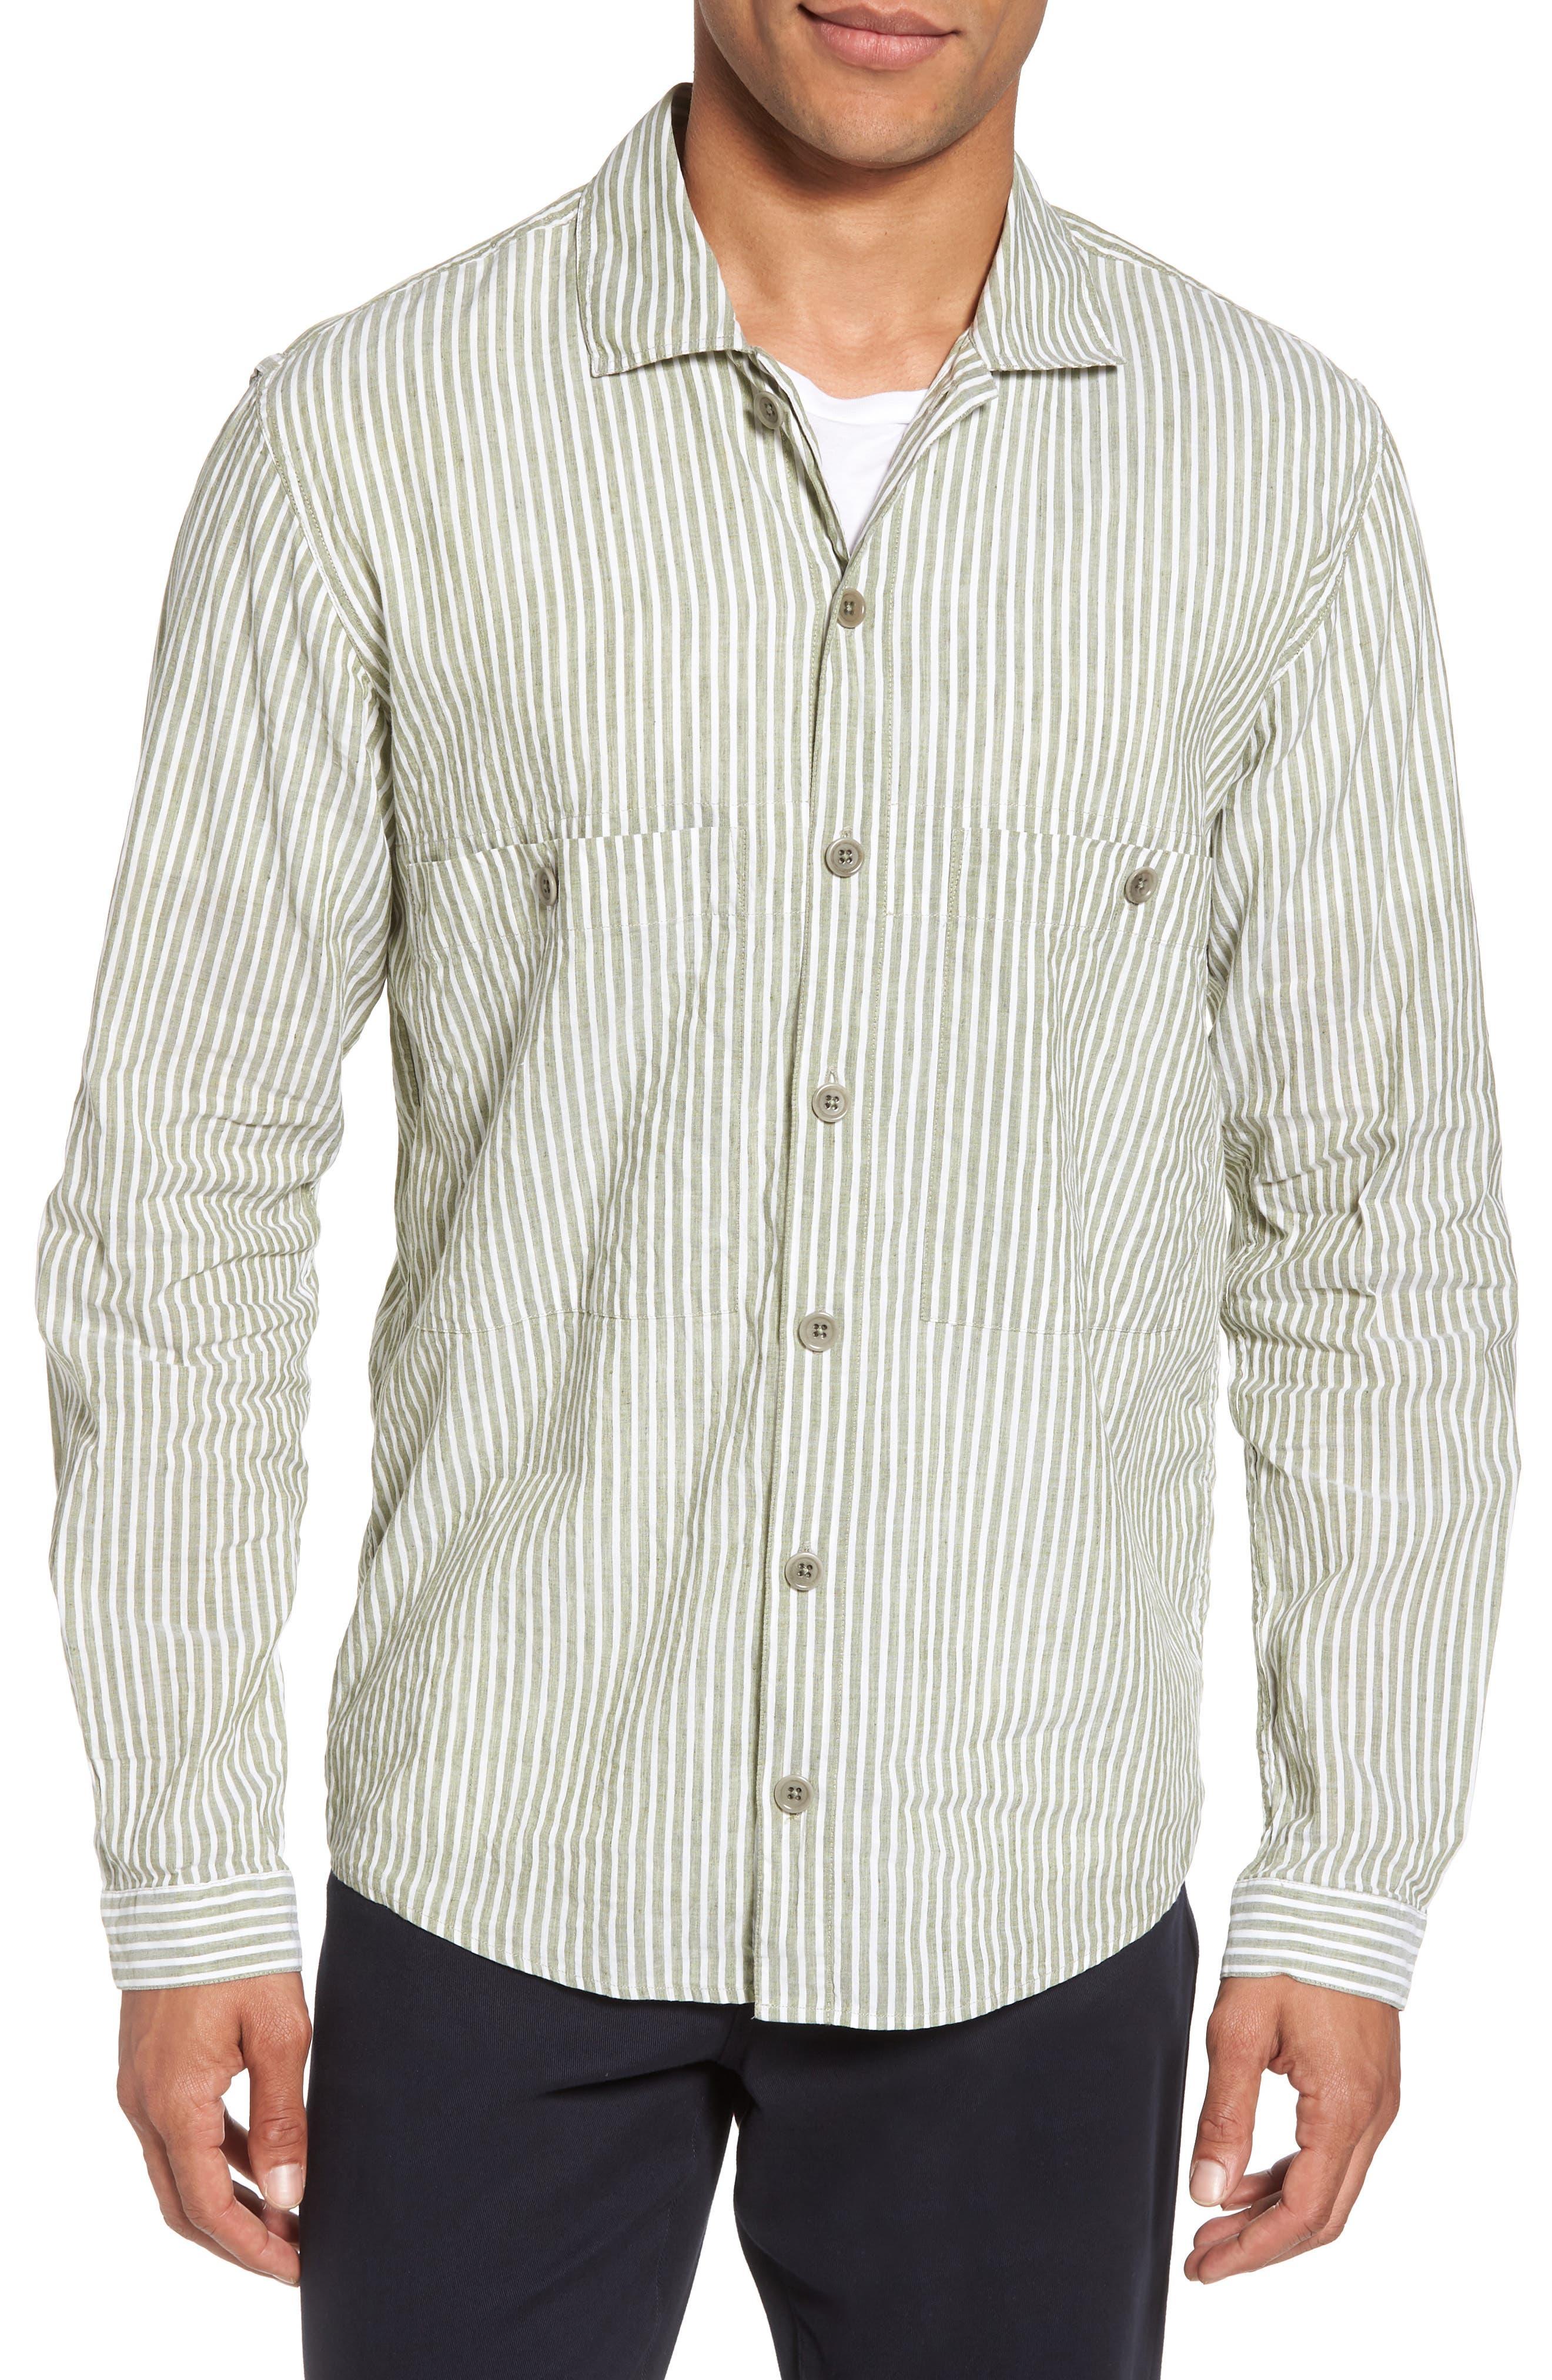 Alternate Image 1 Selected - YMC Doc Savage Regular Fit Sport Shirt